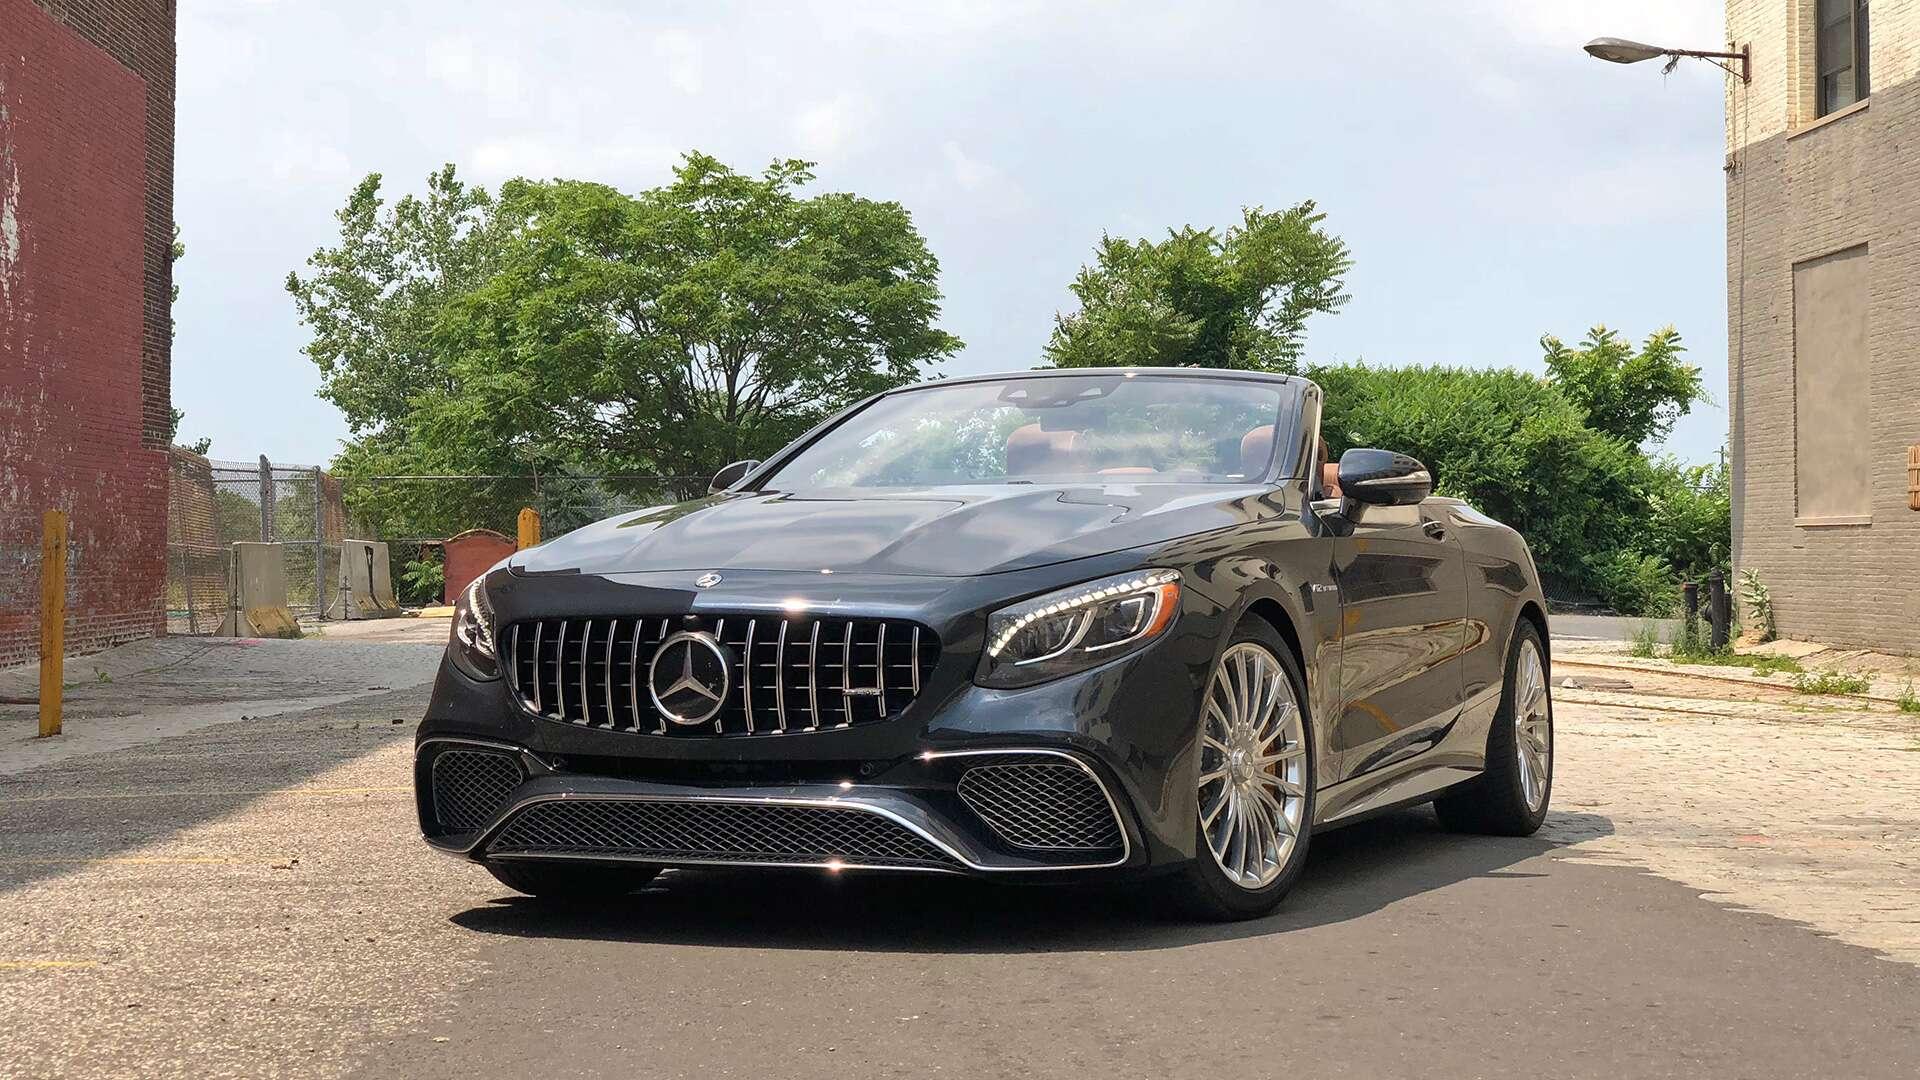 Mercedes Amg S65 Cabriolet Will Sabel Courtney